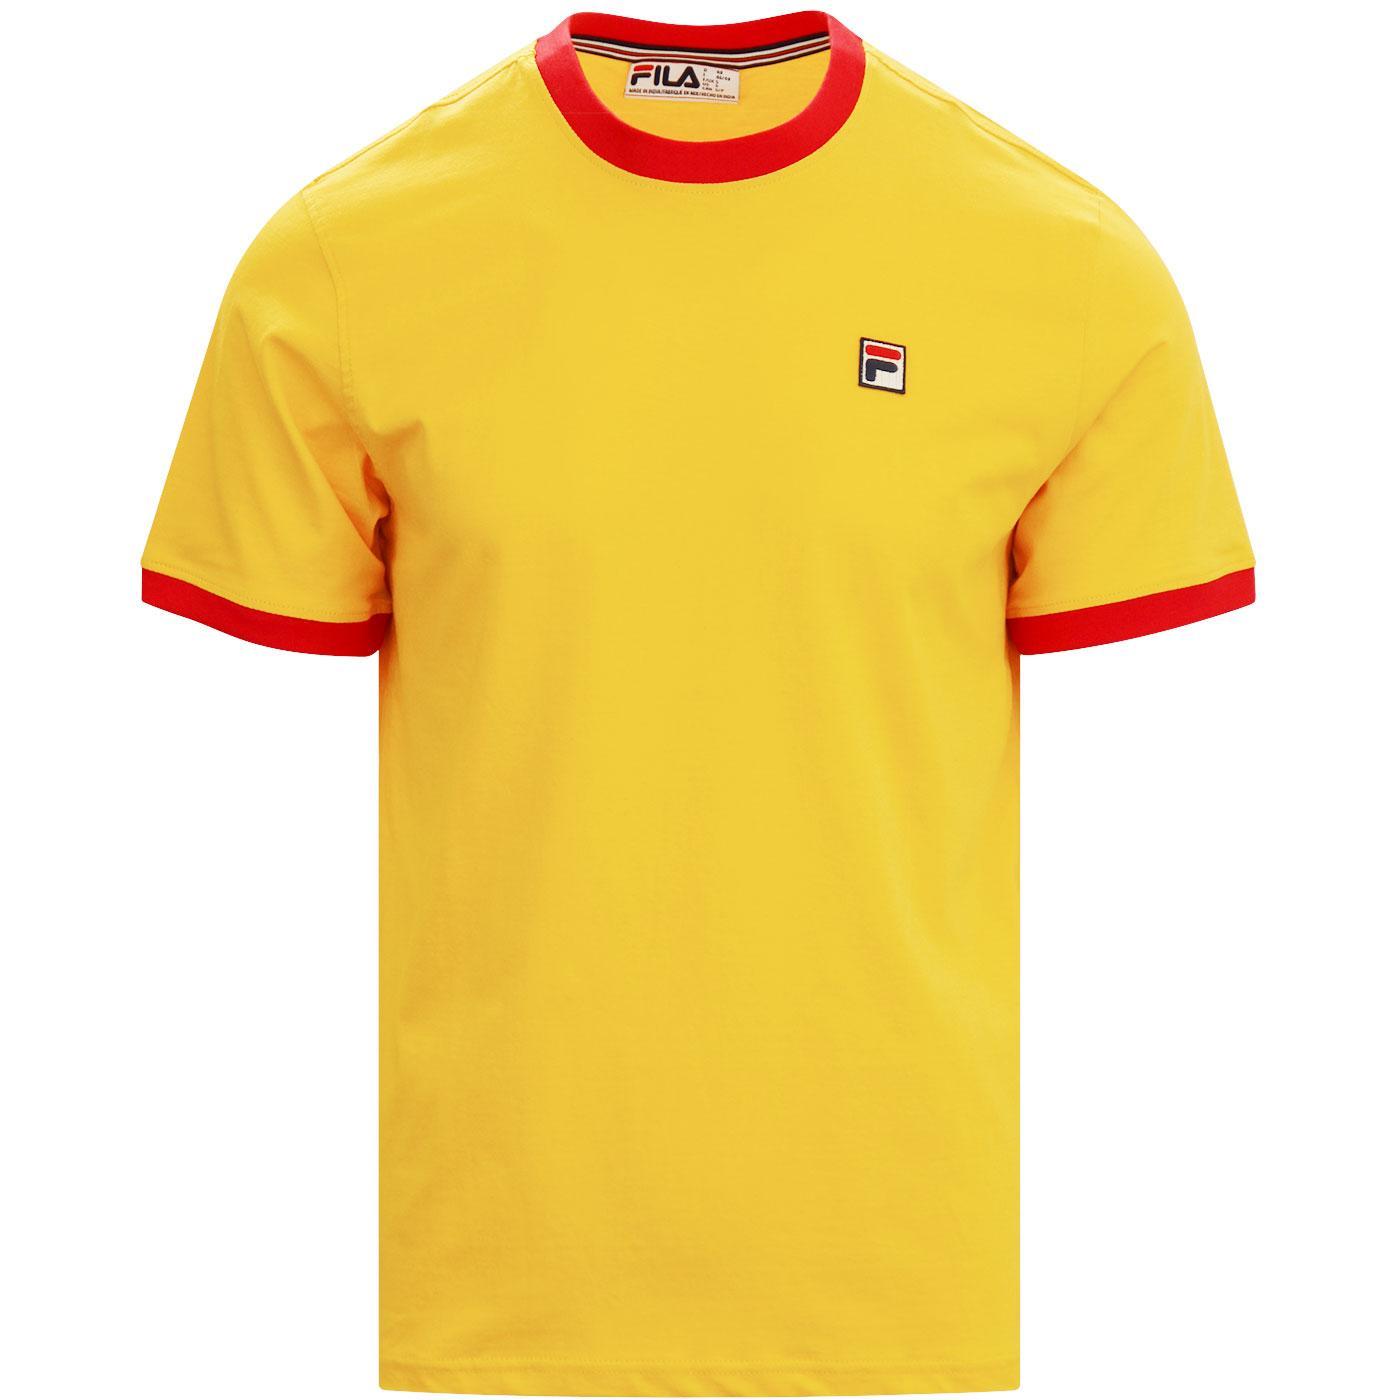 Marconi FILA VINTAGE Retro 70s Ringer T-shirt GOLD